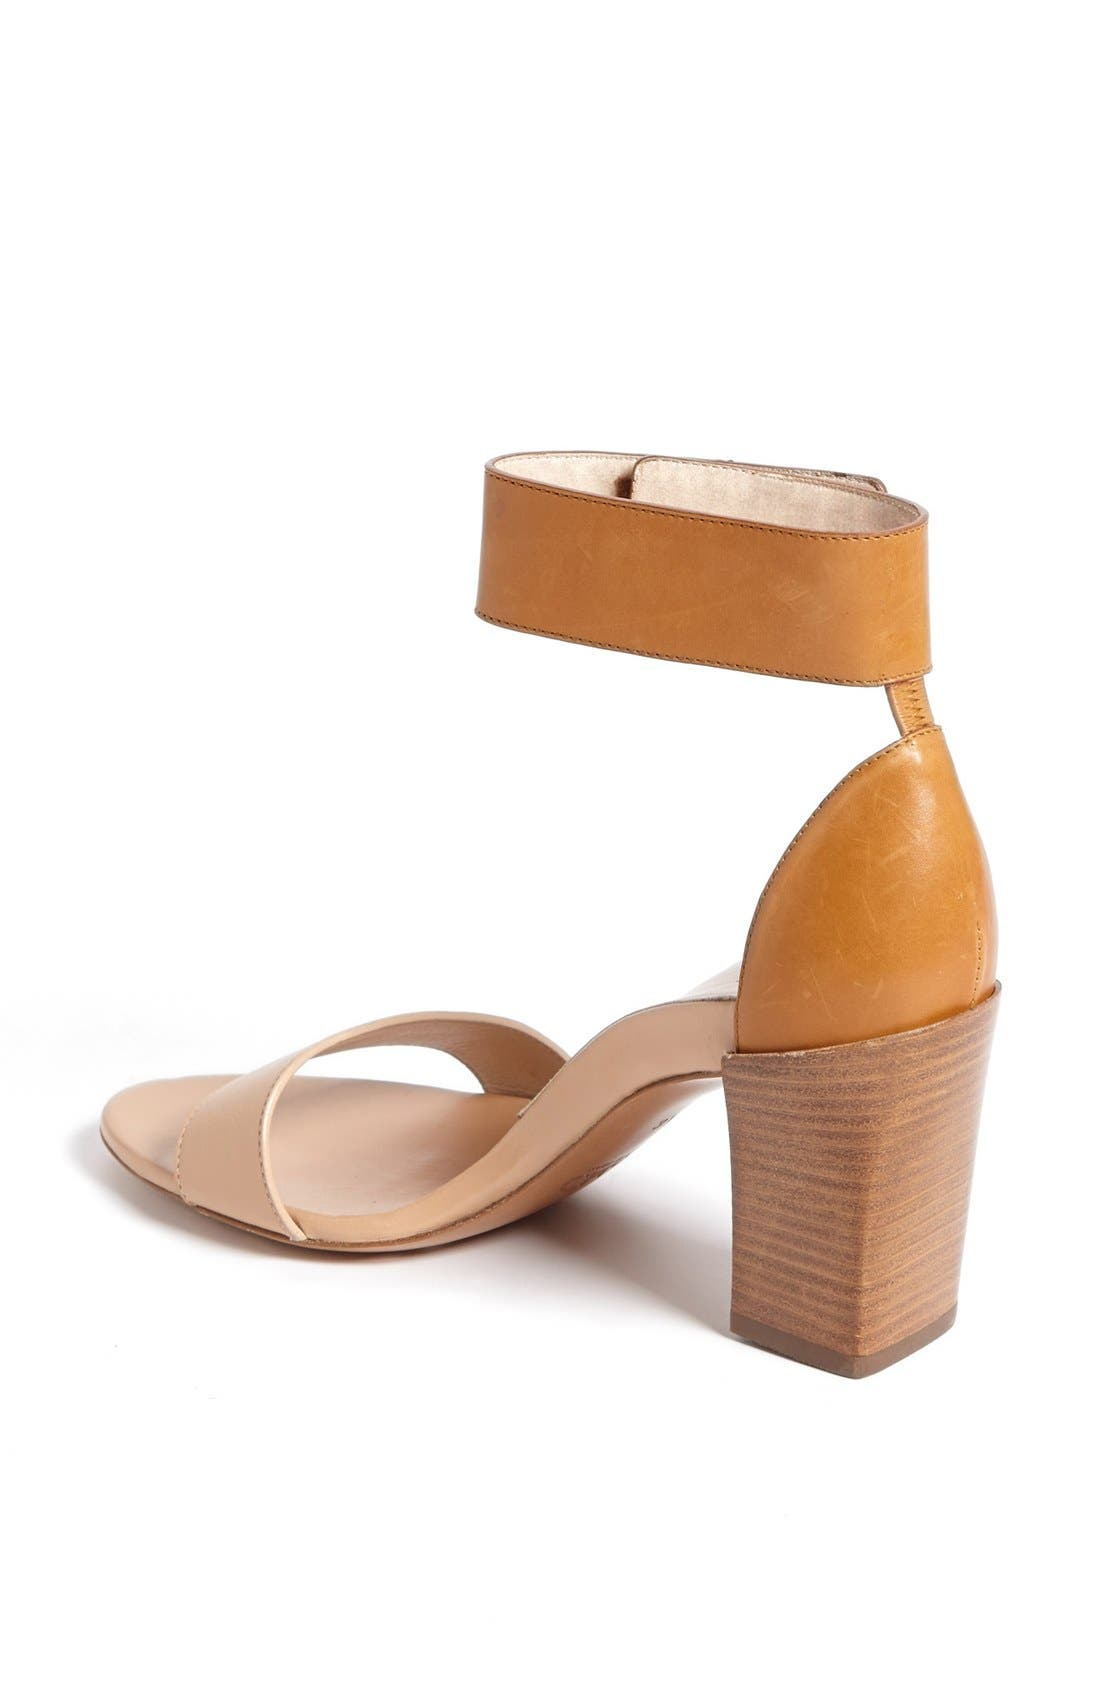 Alternate Image 2  - Chloé 'Gala - Soft Apricot' Sandal